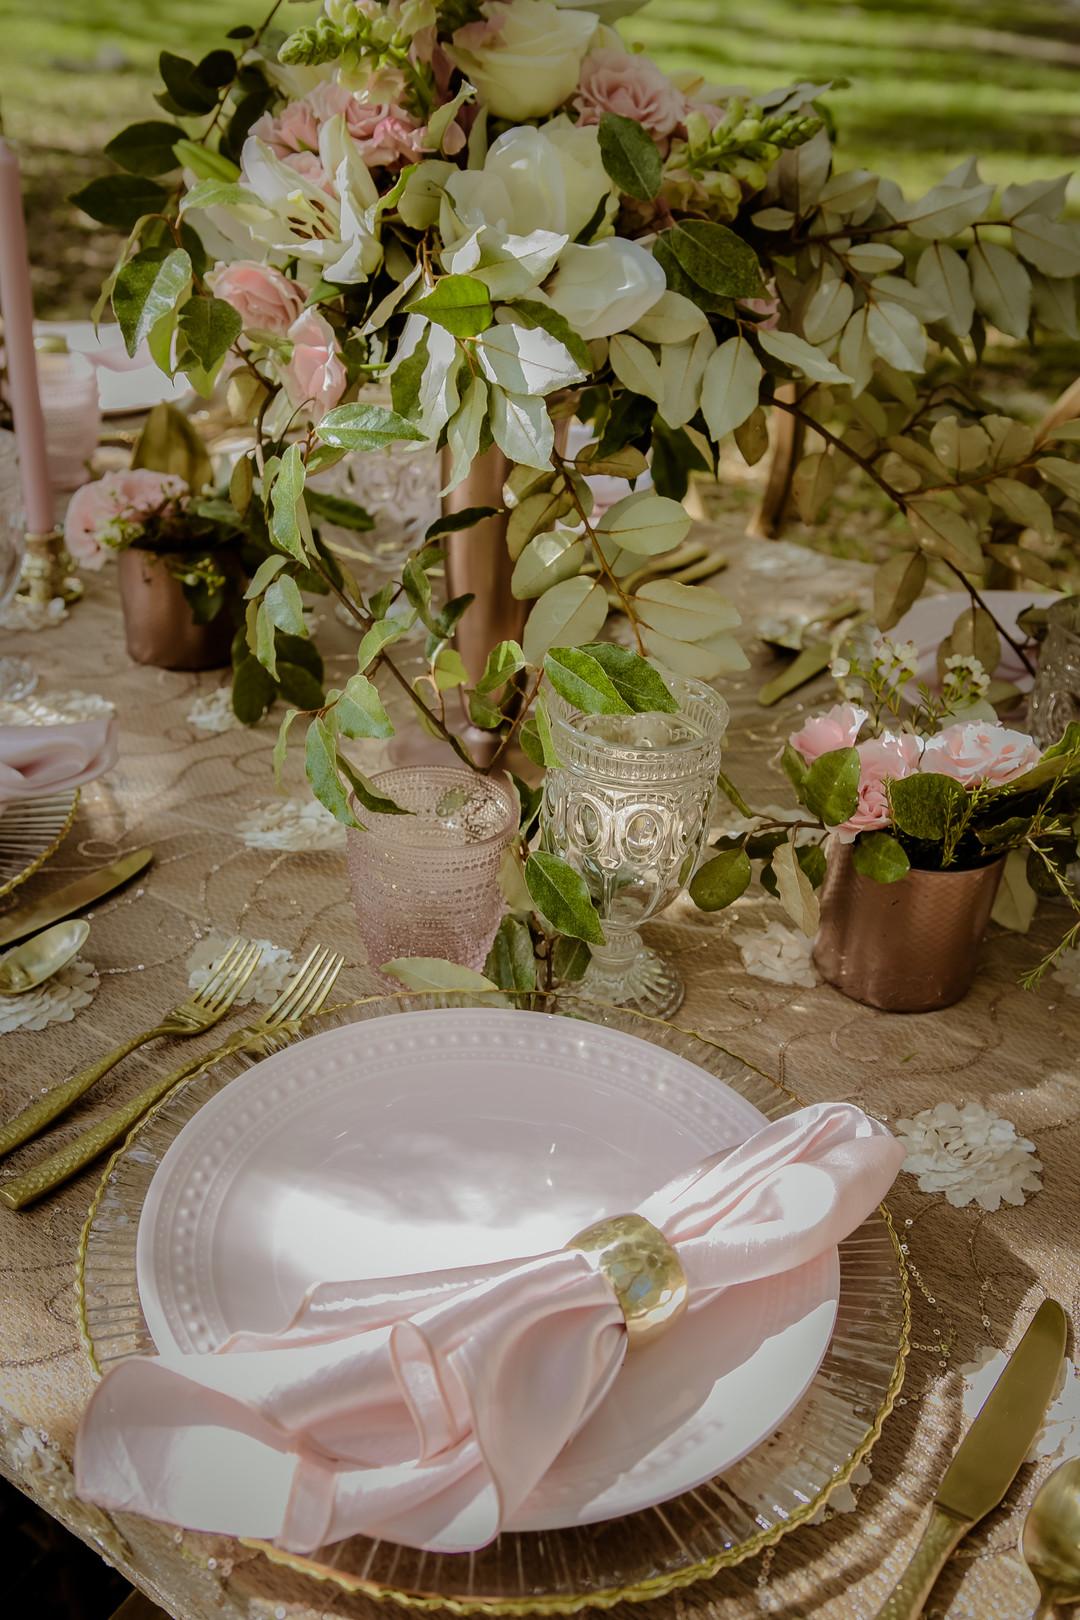 rose-hill-mansion-wedding-4.jpg